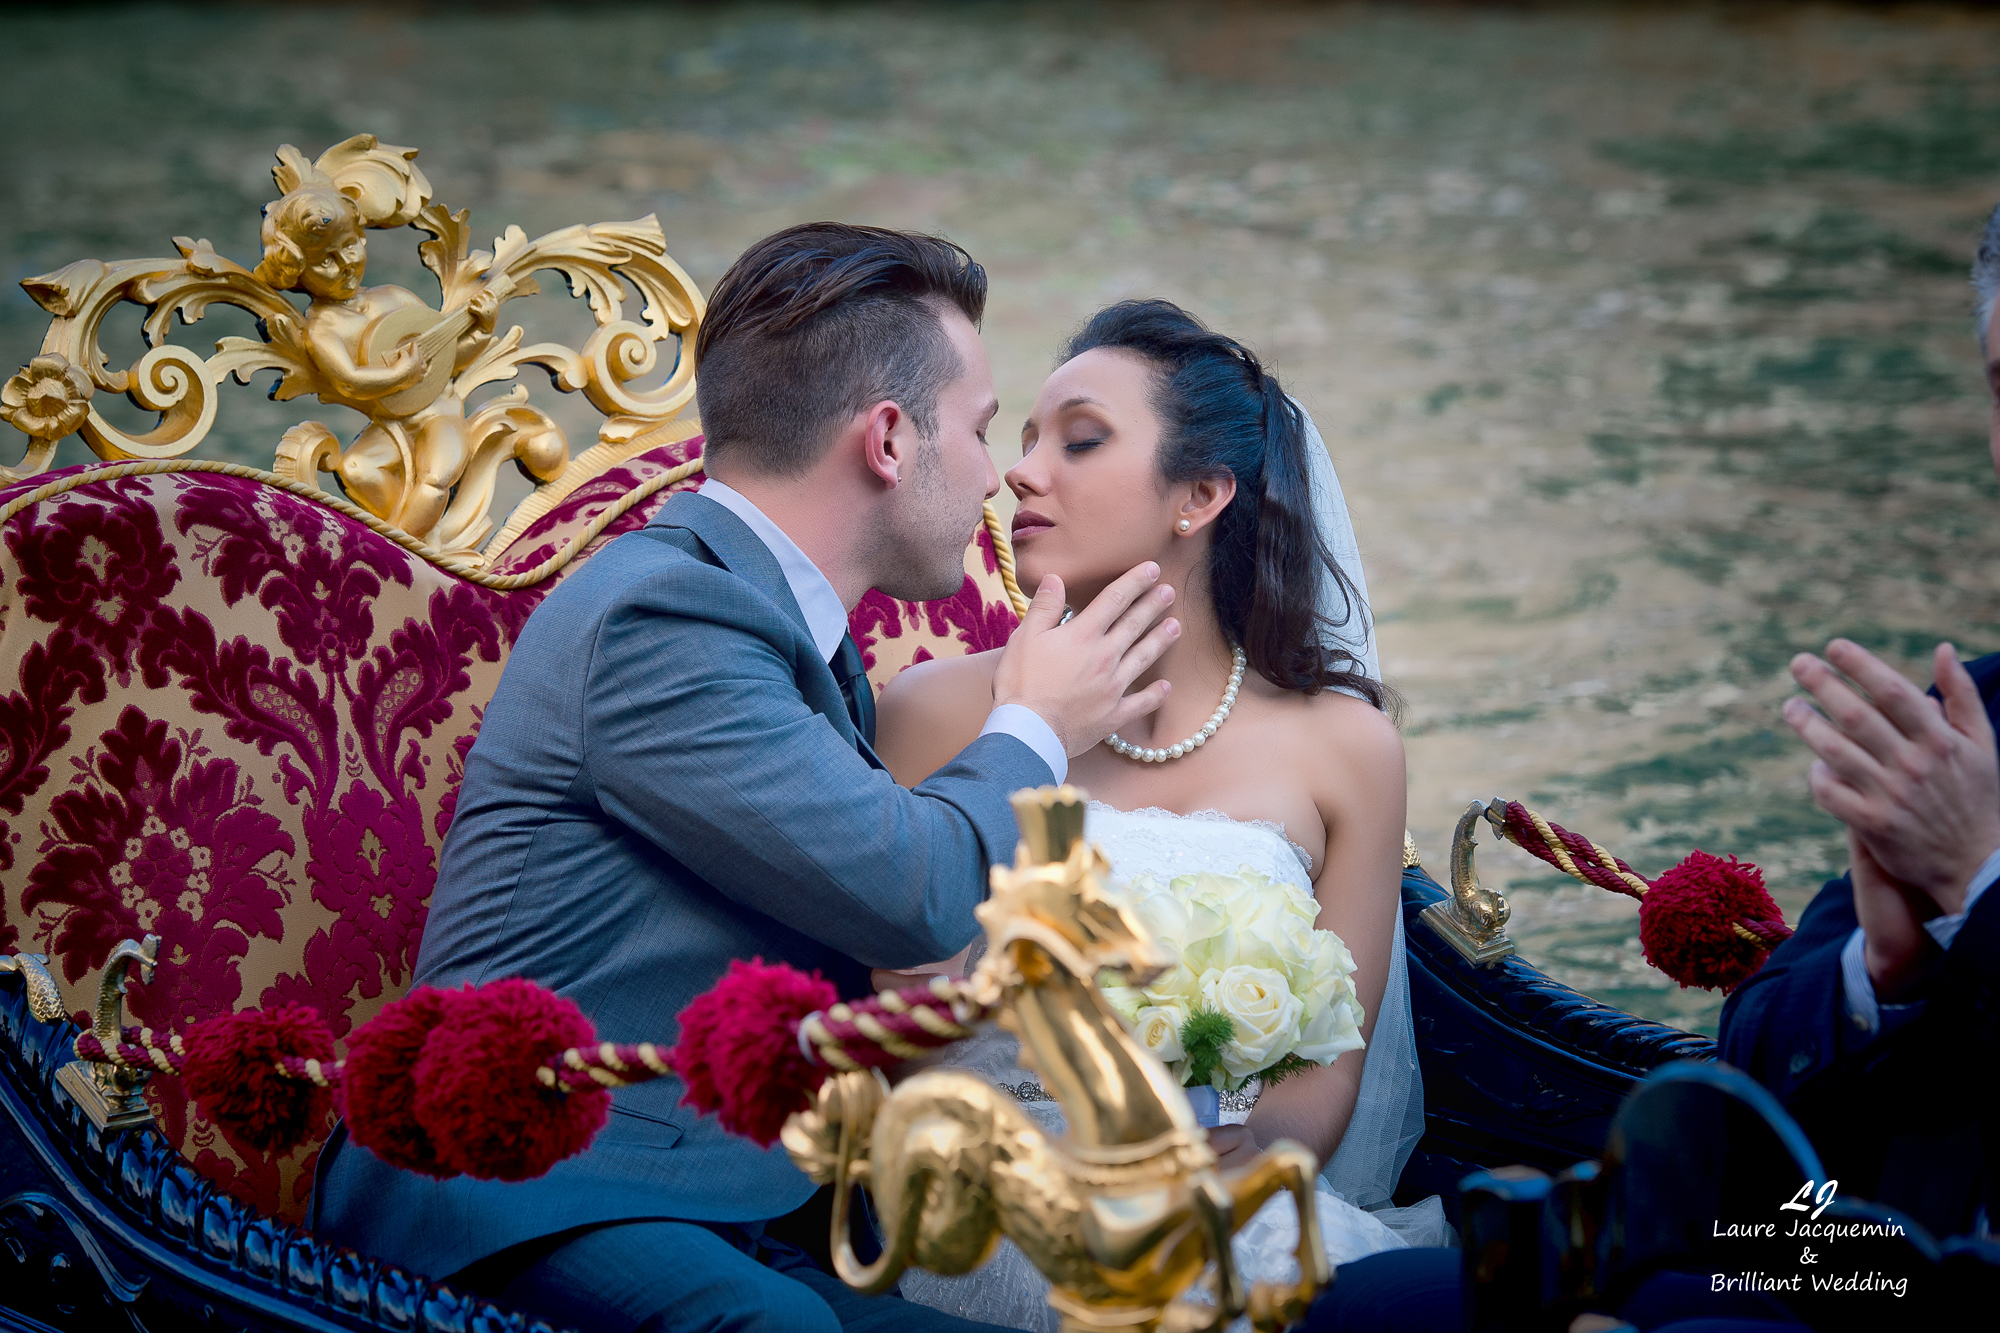 Venice Simbolic Wedding gondola venice Italy laure jacquemin photography (44) copia